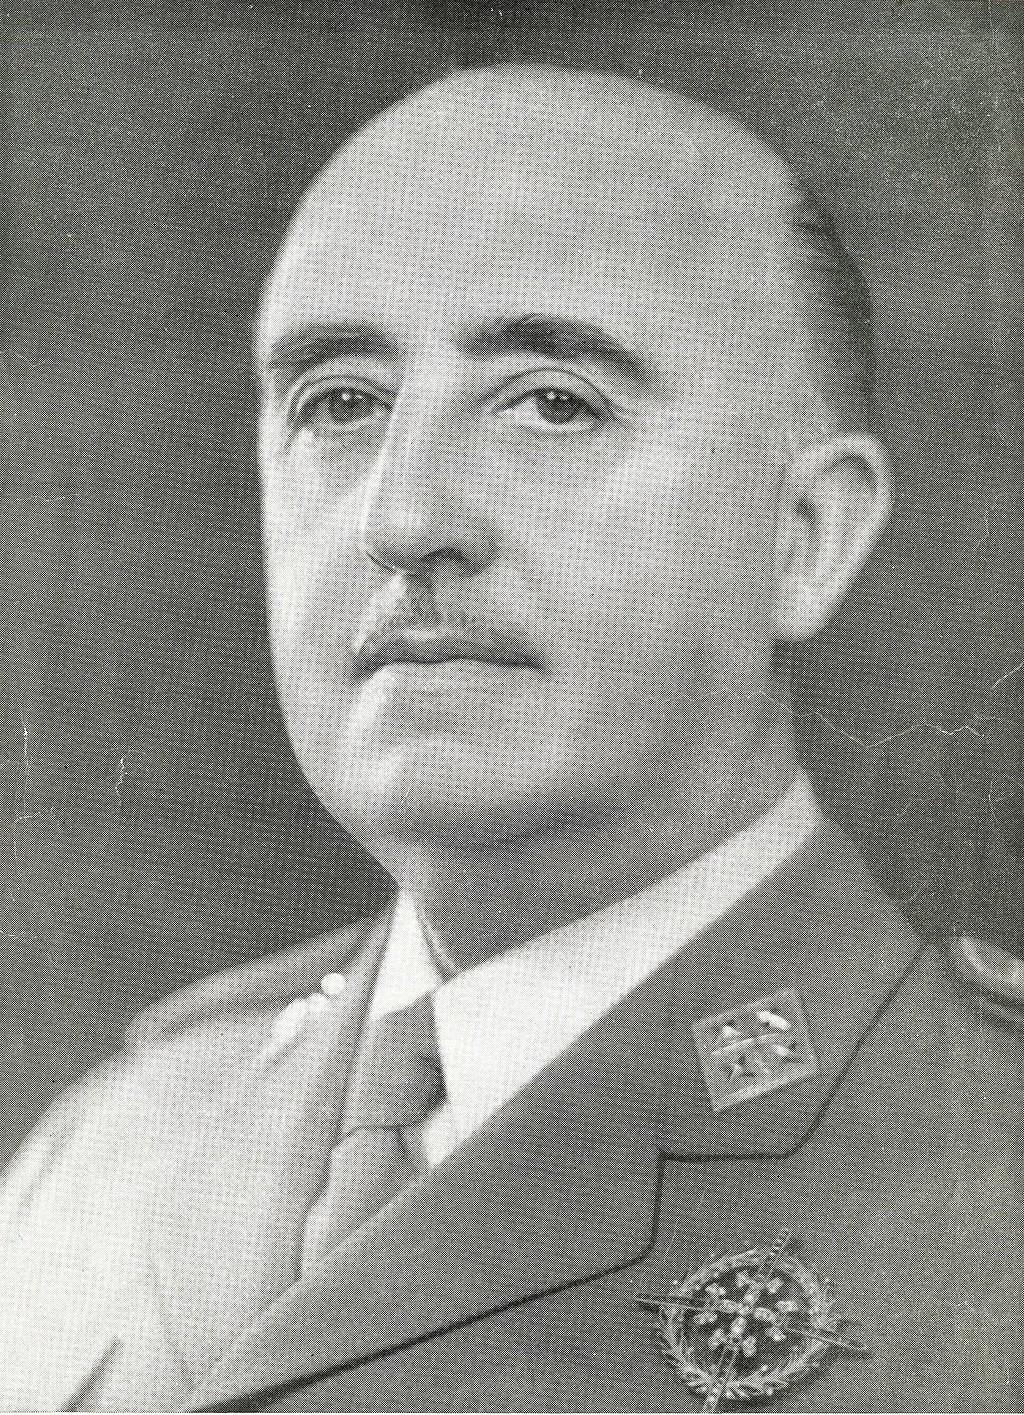 Francisco Franco, 1964